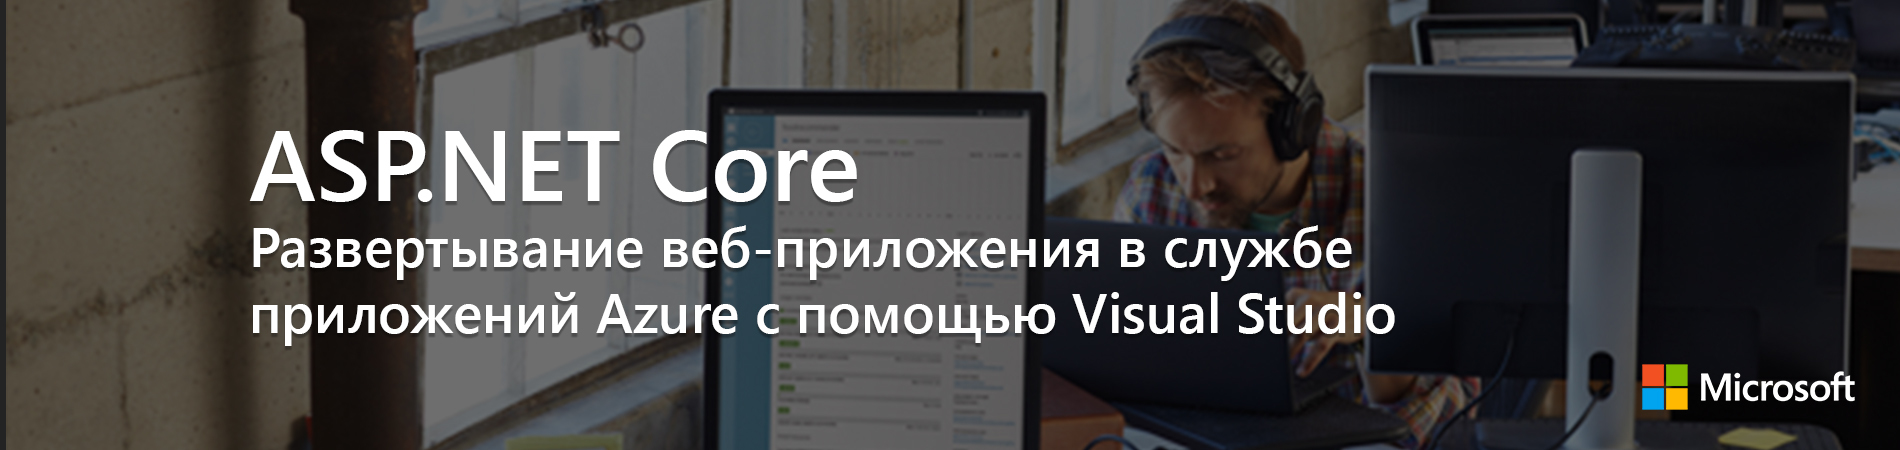 ASP.NET Core: Развертывание веб-приложения в службе приложений Azure с помо ...